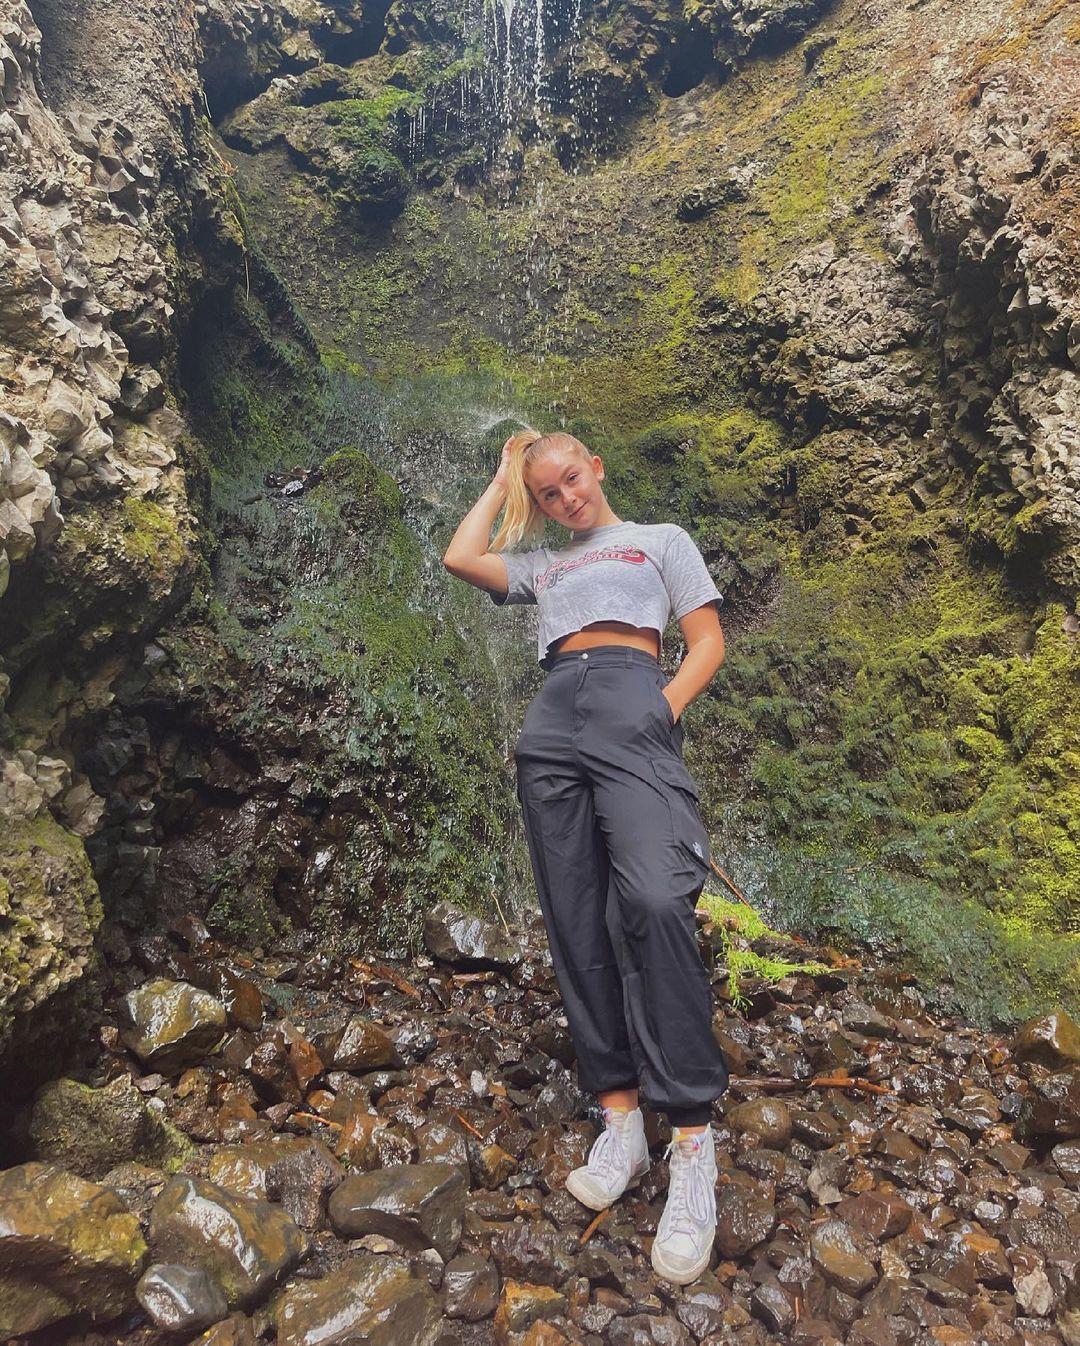 Hannah-Joarnold-Wallpapers-Insta-Fit-Bio-hannahjo-Wallpapers-Insta-Fit-Bio-9